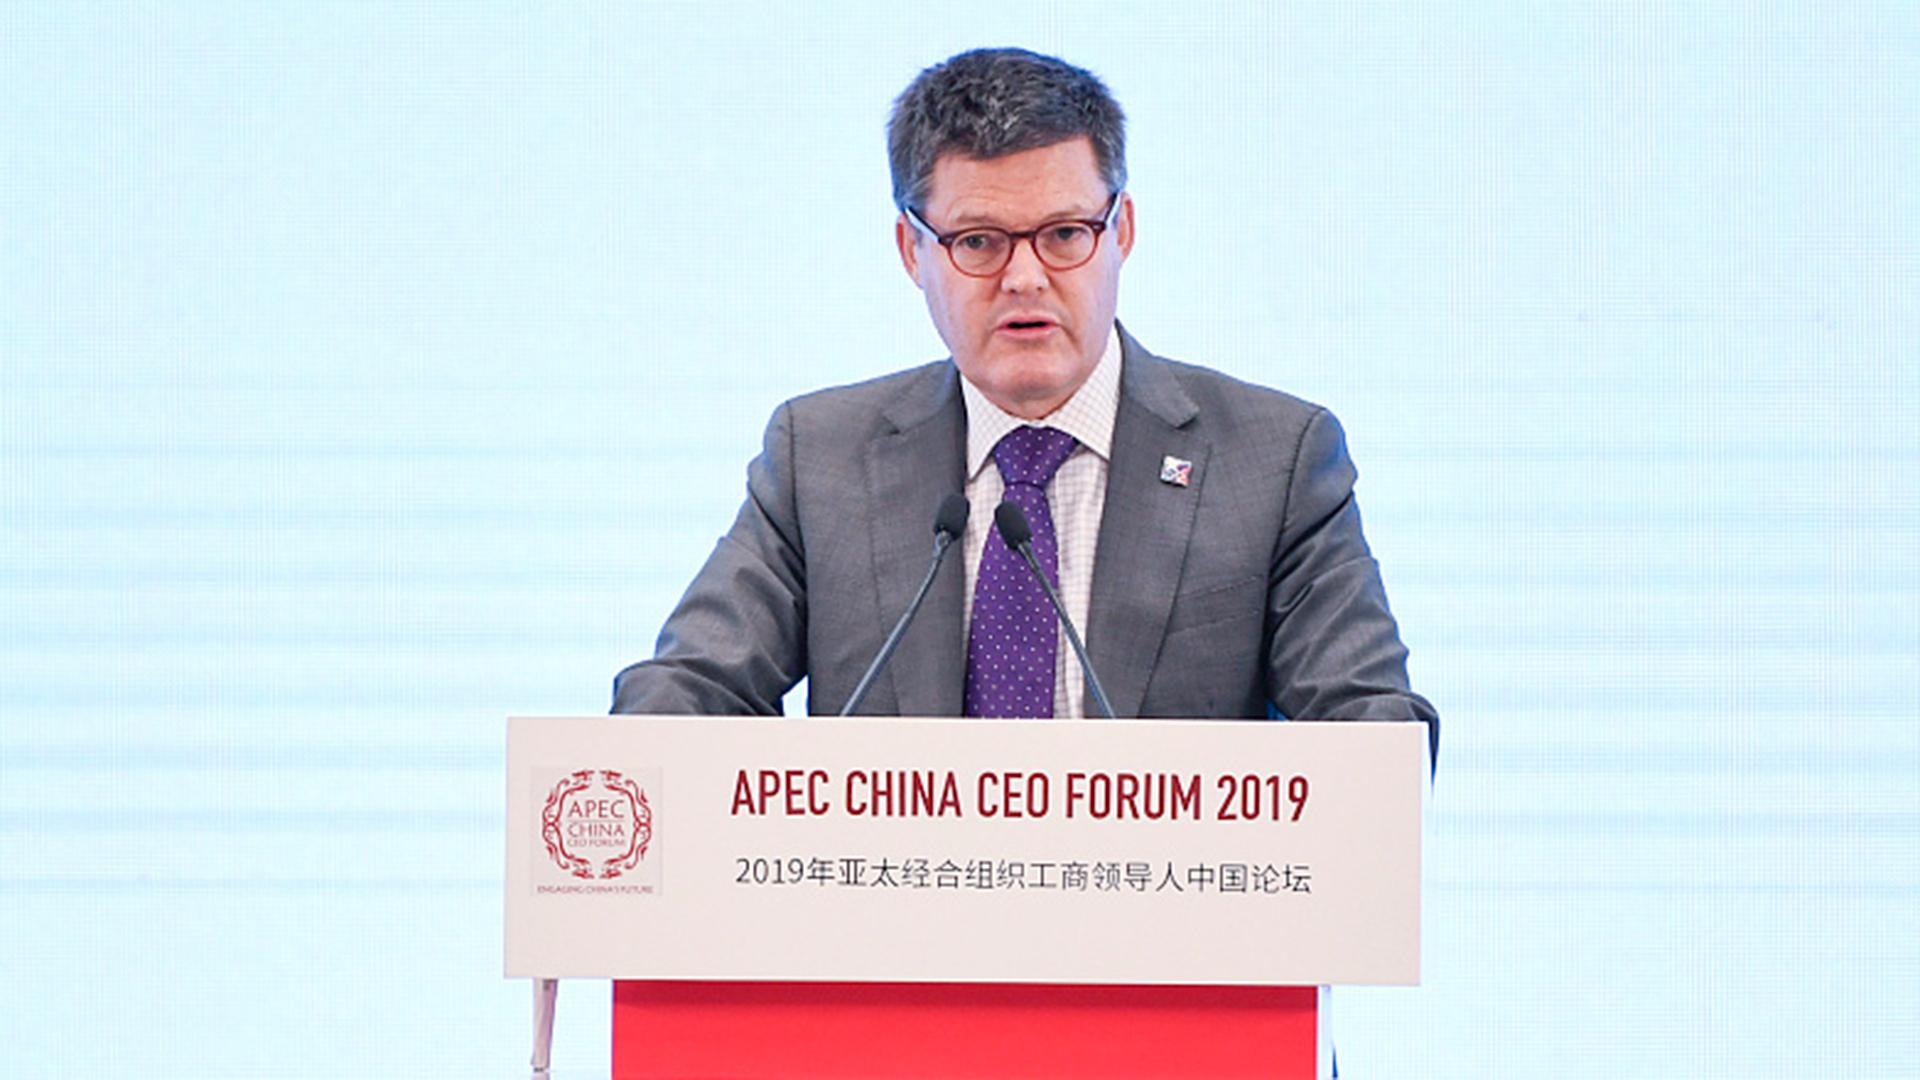 APEC at 30: 2019 SOM chair shares his views - CGTN